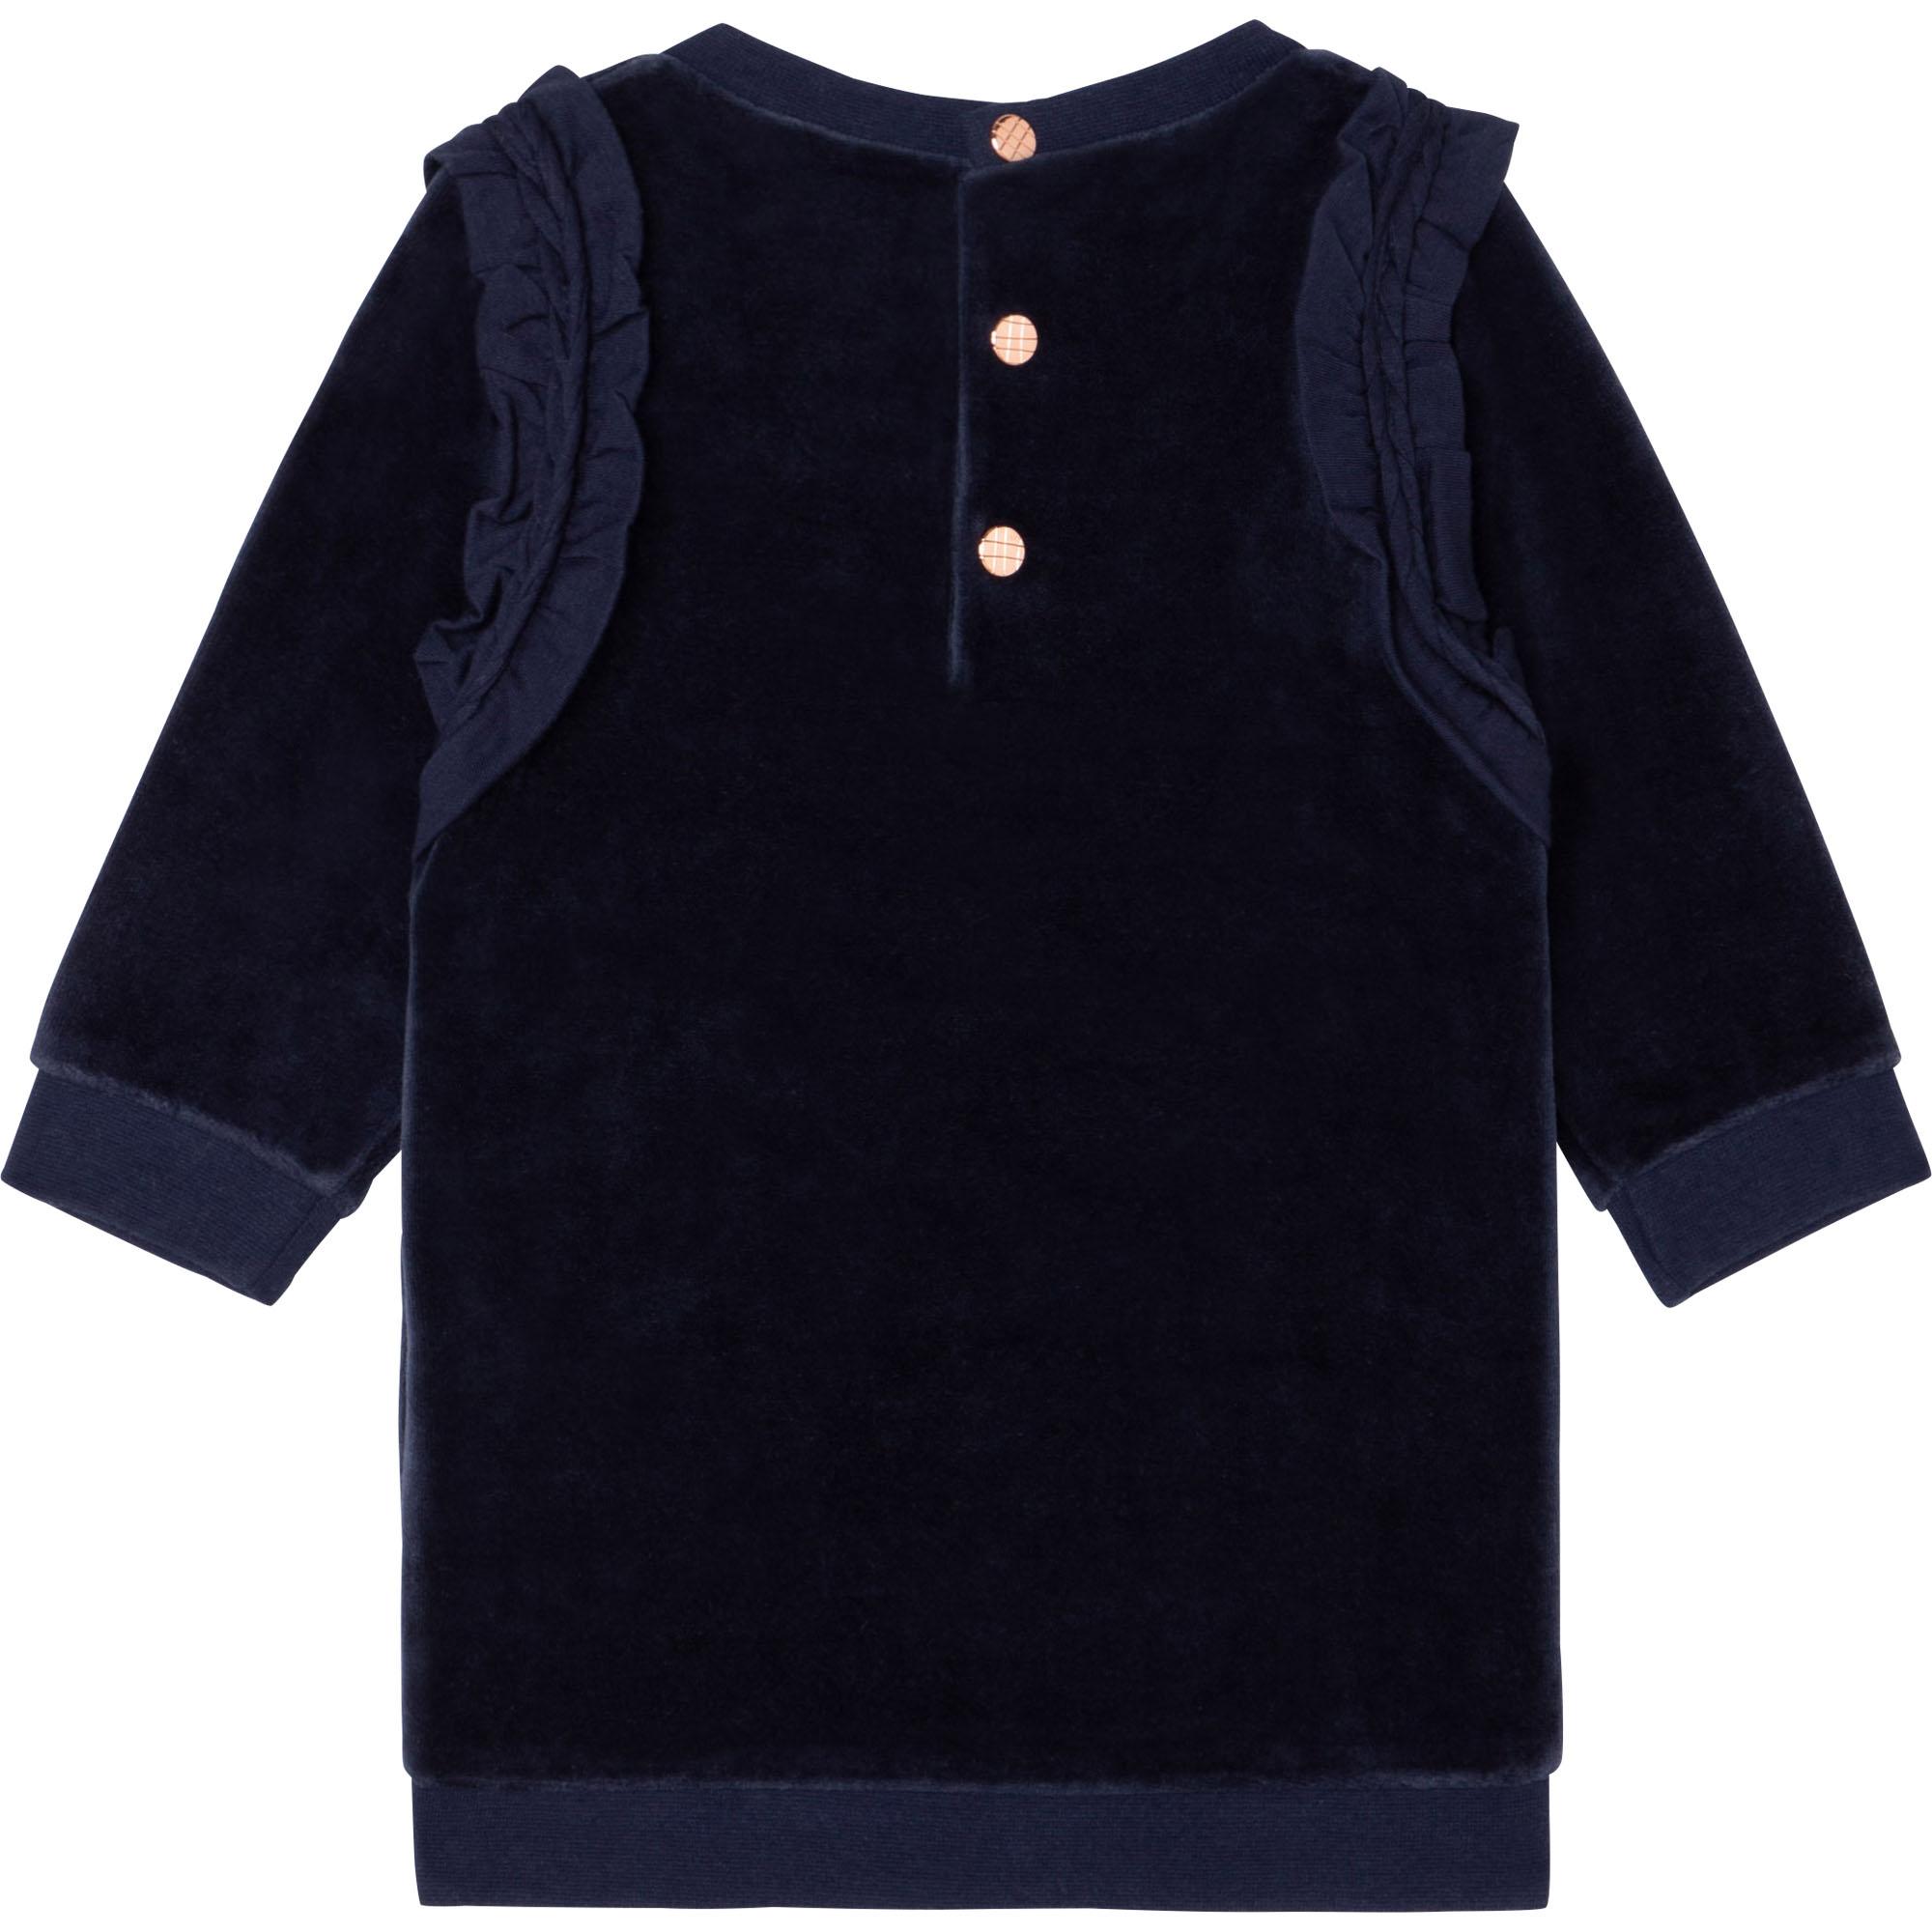 DRESS CARREMENT BEAU for GIRL